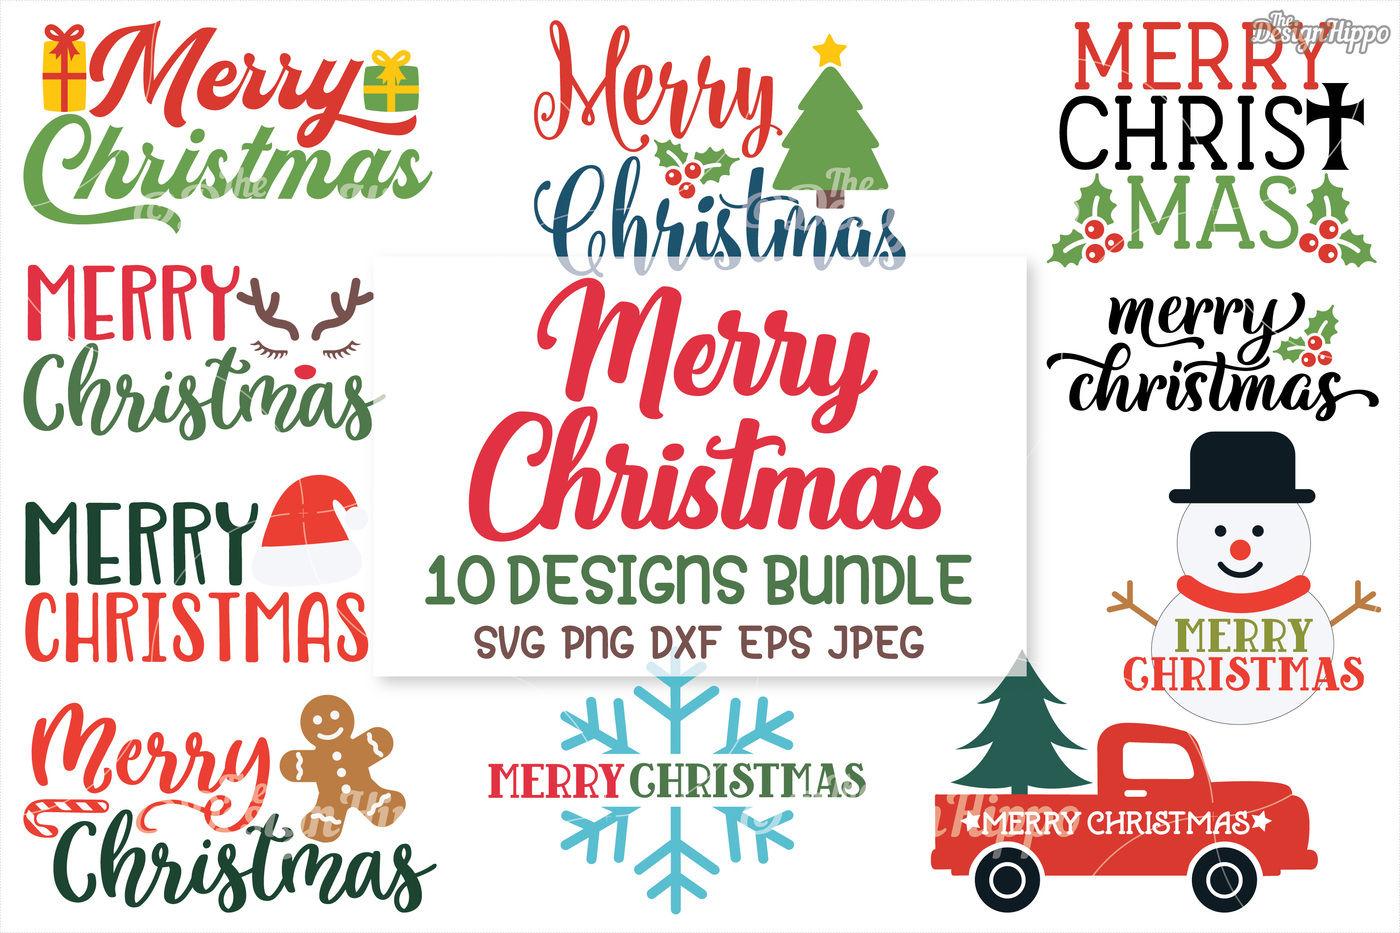 Merry Christmas Svg Bundle Christmas Svg Png Dxf Cricut Cut